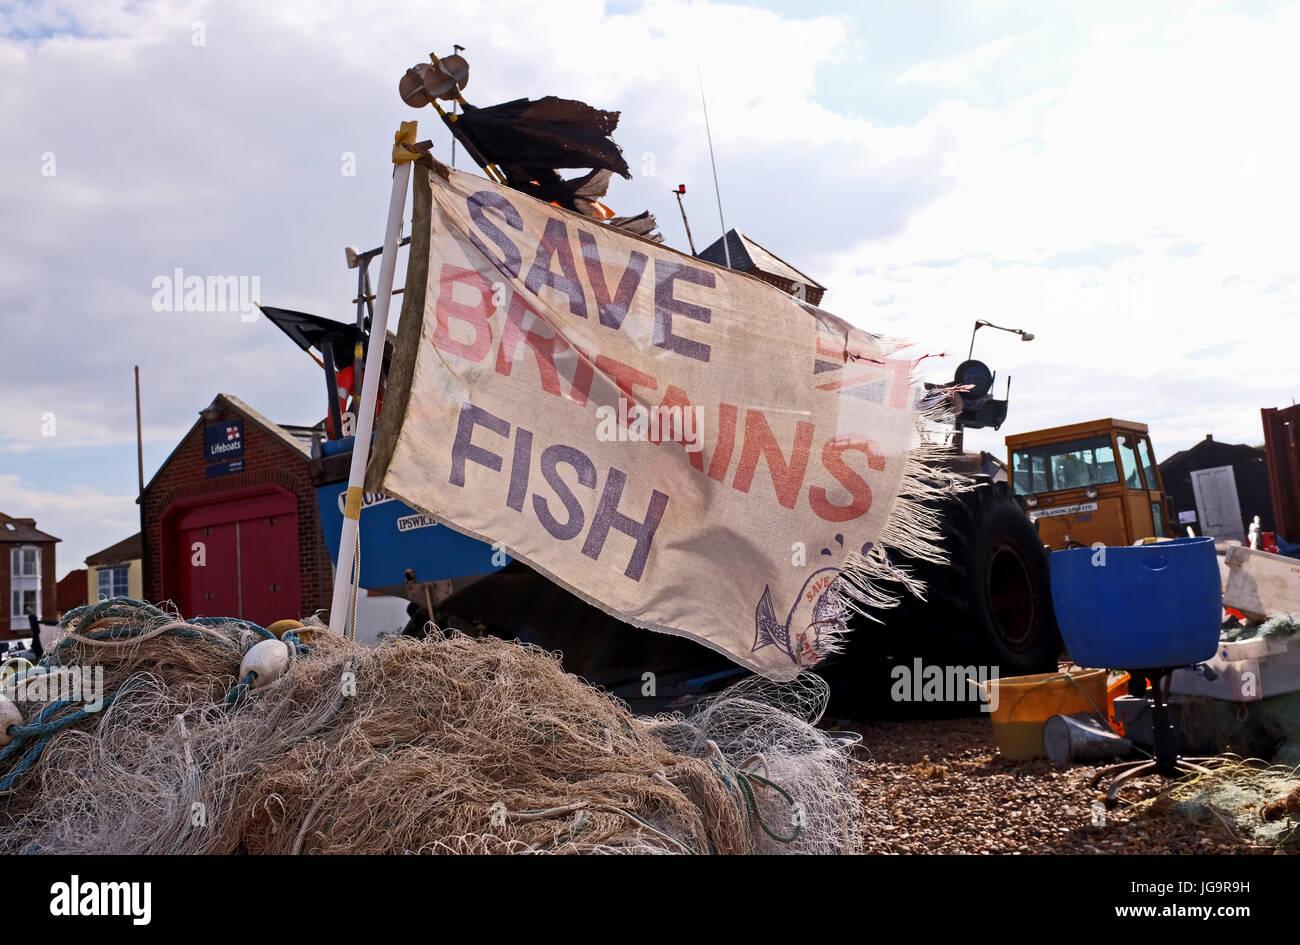 Aldeburgh Suffolk UK June 2017 - Tatty Save Britains Fish flags on fishing boats on Aldeburgh beach Photograph taken - Stock Image